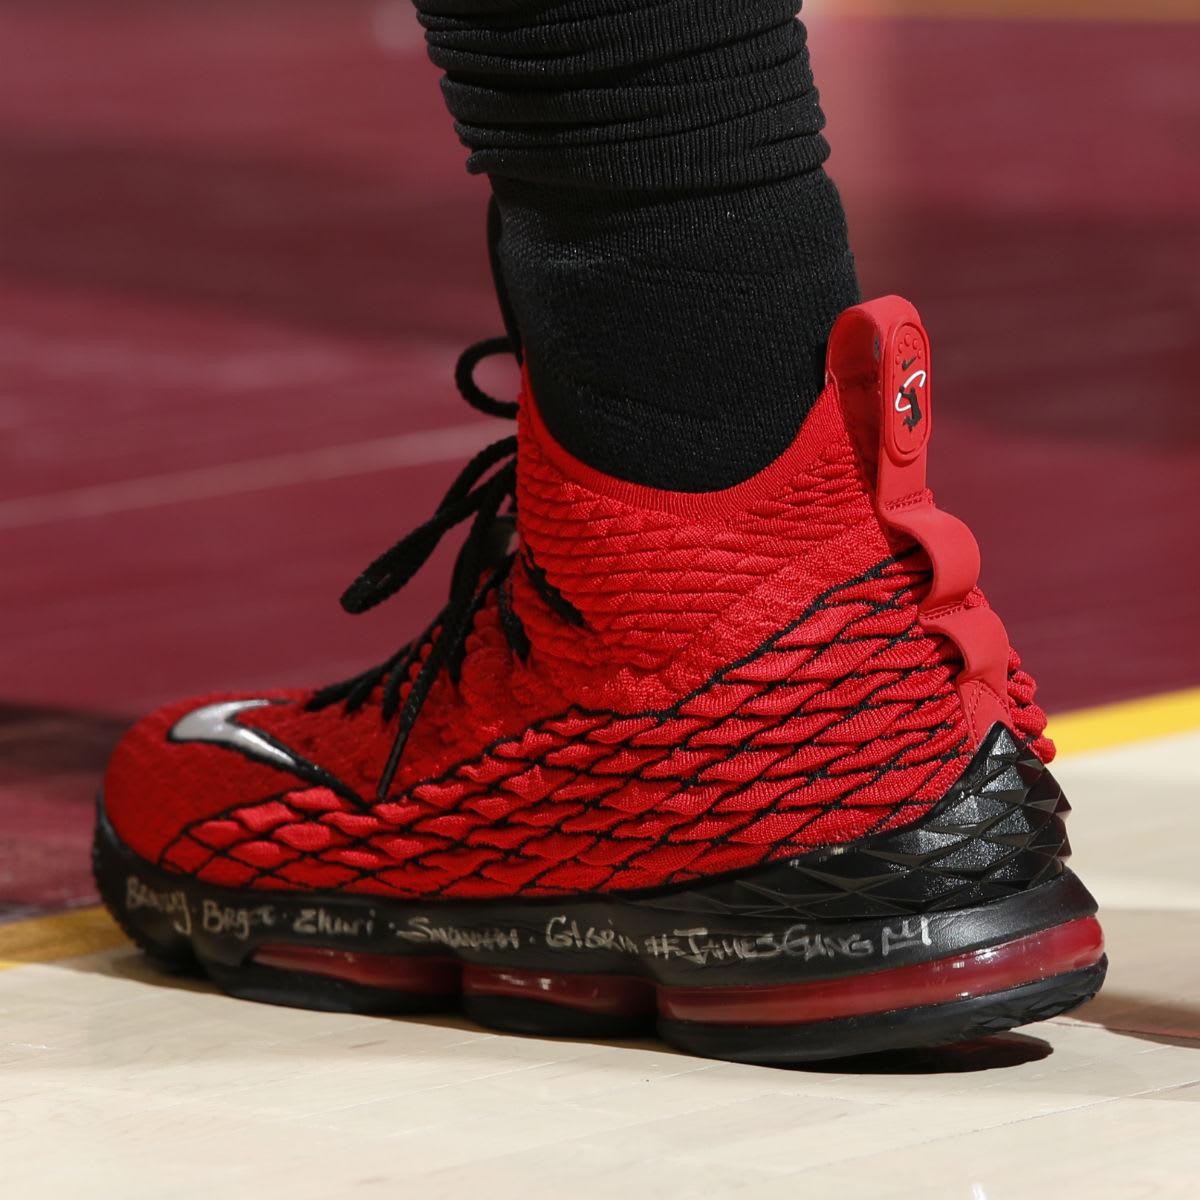 ed12d4c09662 Nike LeBron 15 XV Red Griffey - Premier Kicks